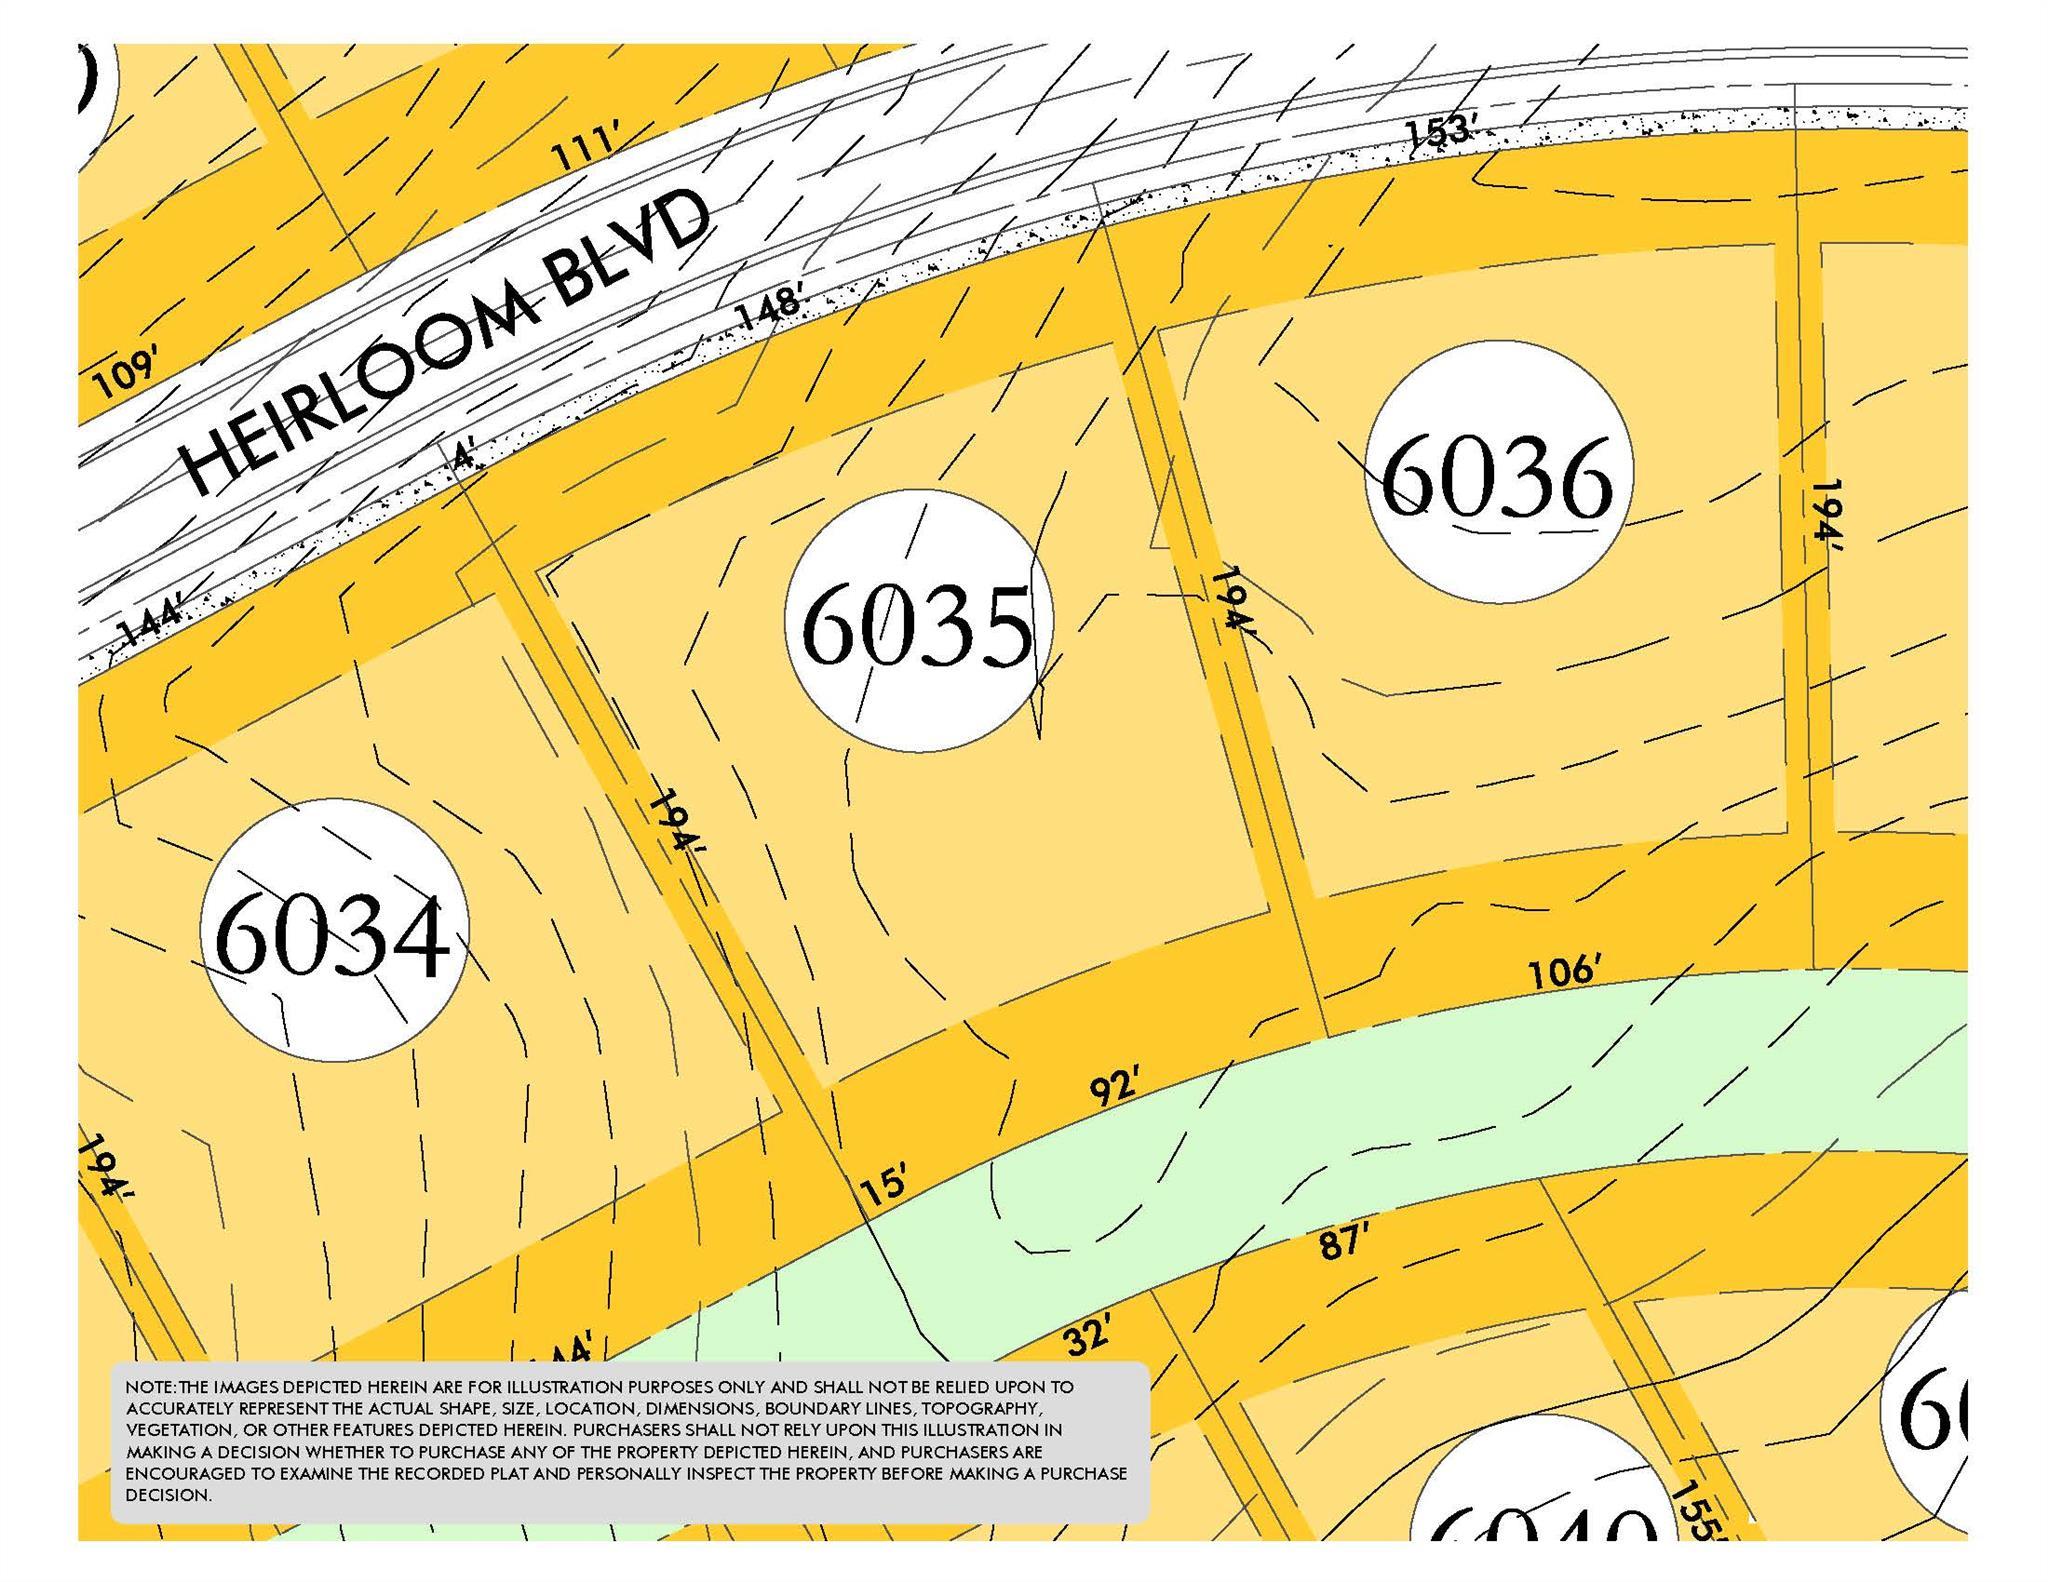 8460 Heirloom Blvd (Lot 6035), College Grove, TN 37046 - College Grove, TN real estate listing